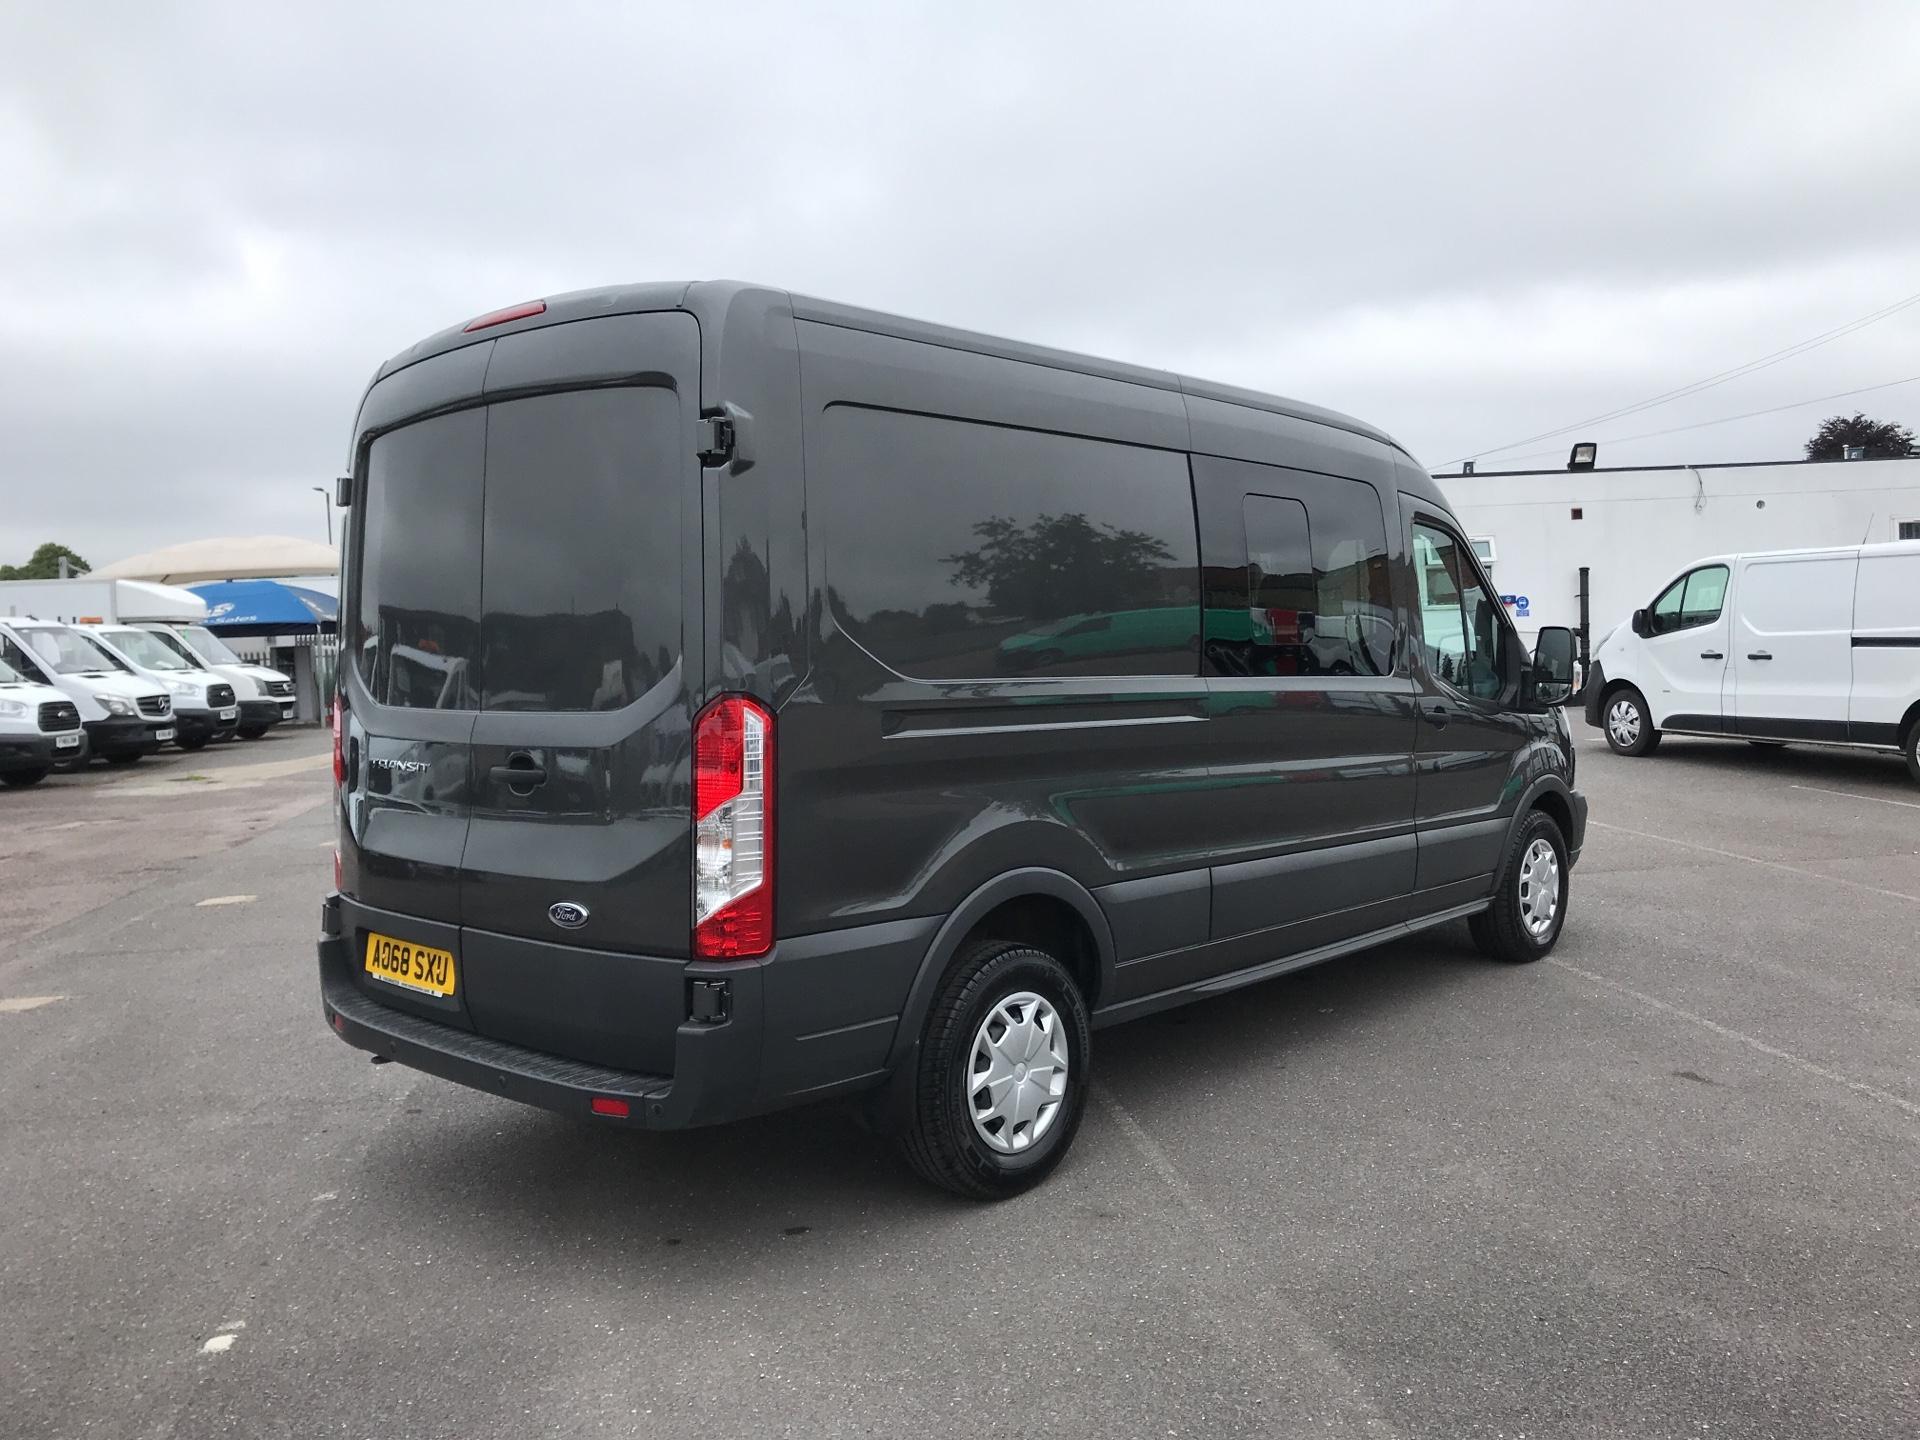 2018 Ford Transit 2.0 Tdci 130Ps H2 D/Cab Van EURO 6 (AO68SXU) Image 3